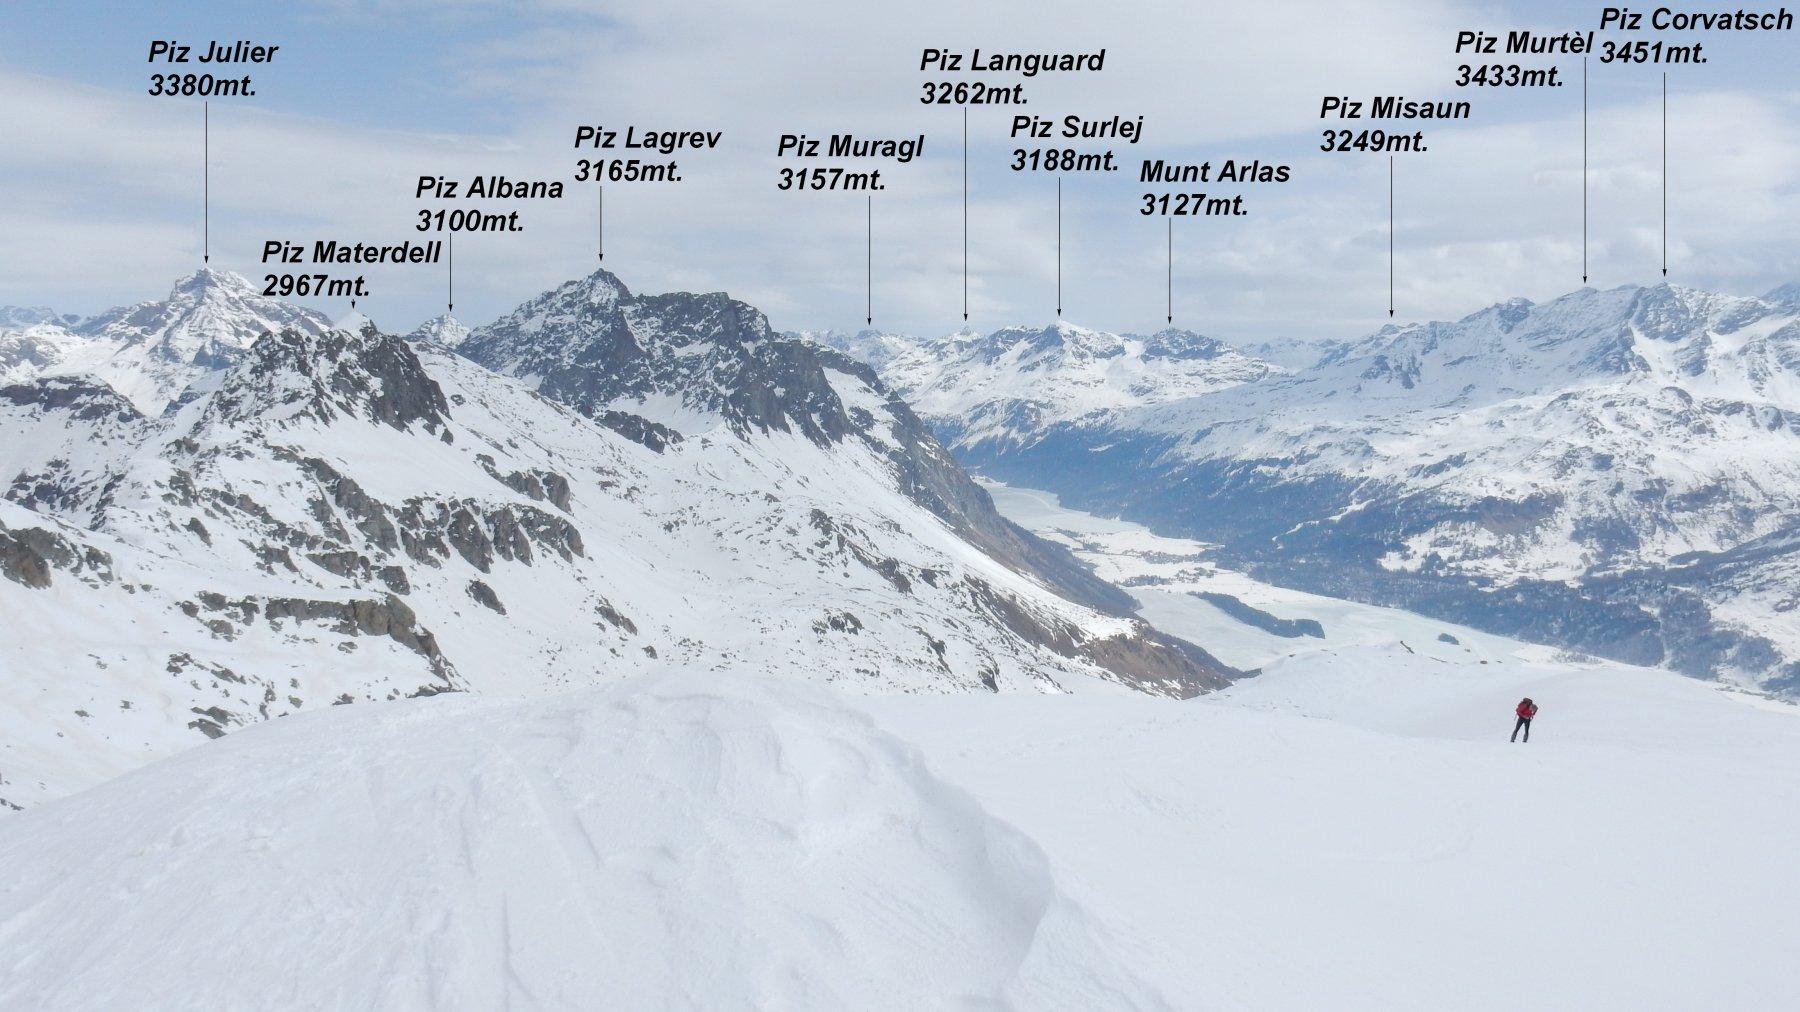 Panorama dalla vetta del Piz Grevasalvas 2932mt.